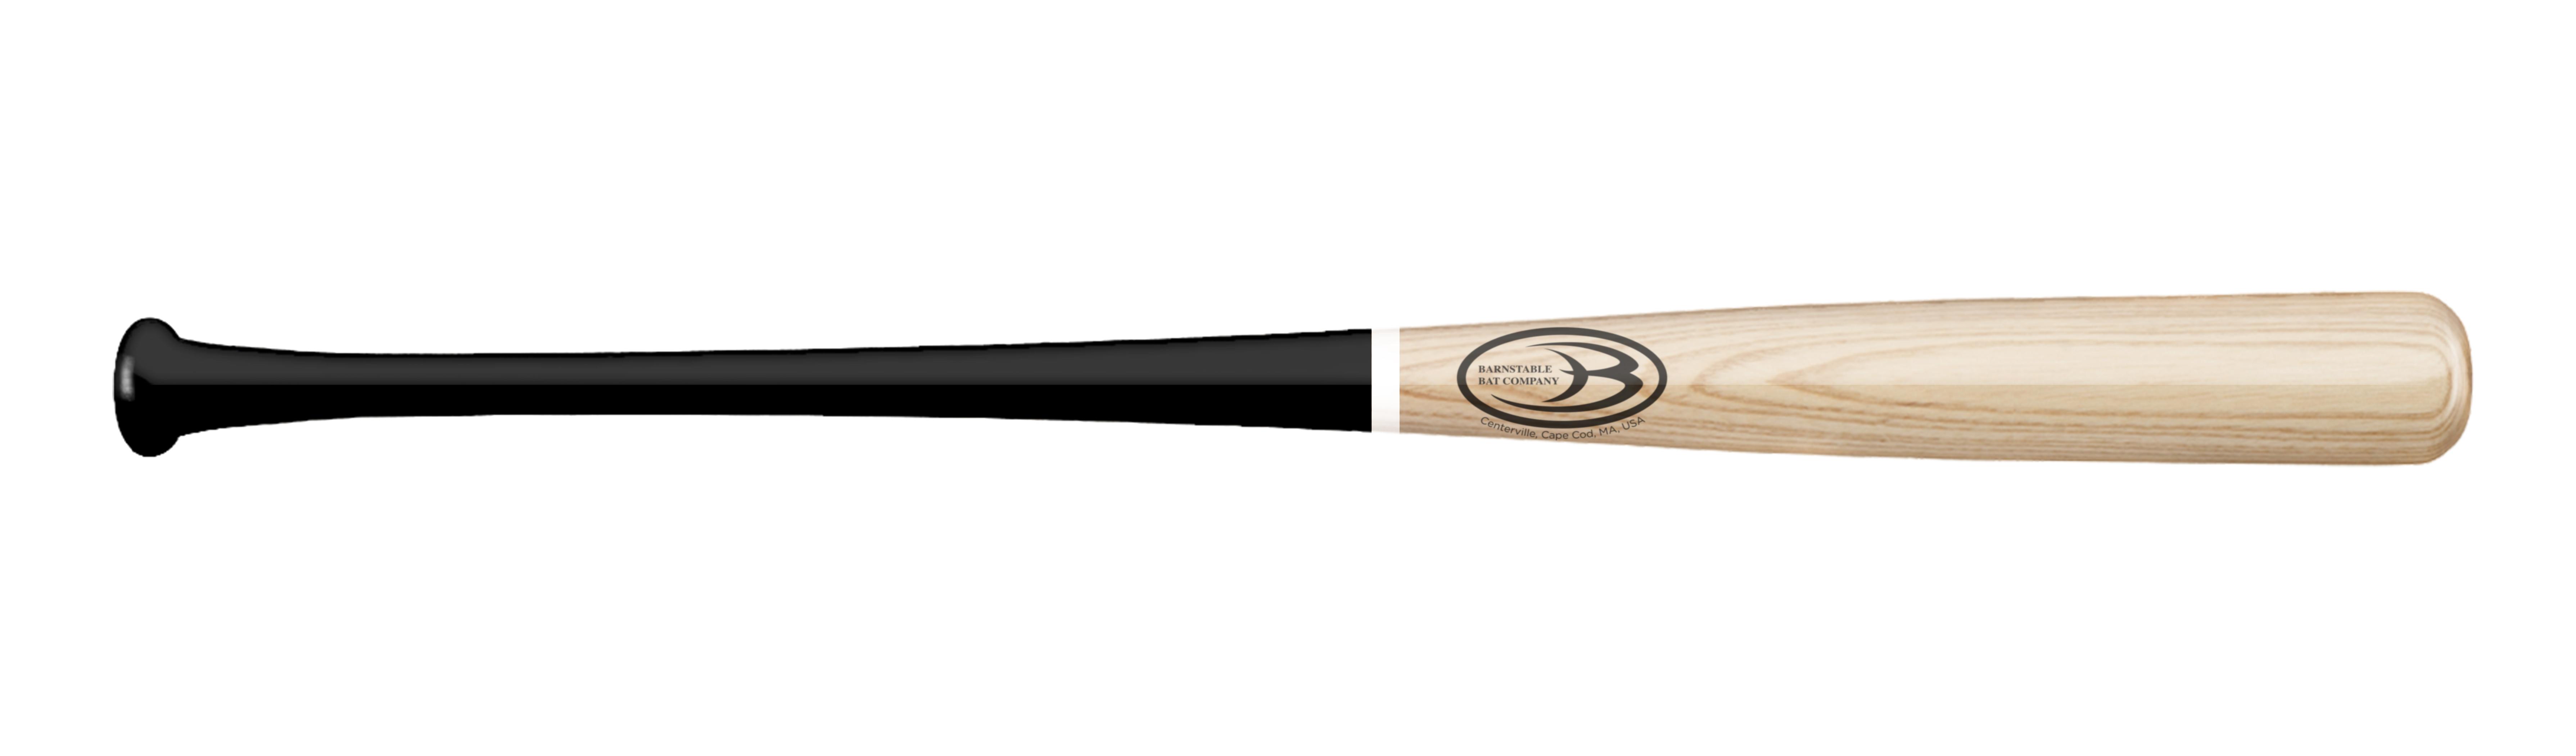 Baseball HD PNG - 93018